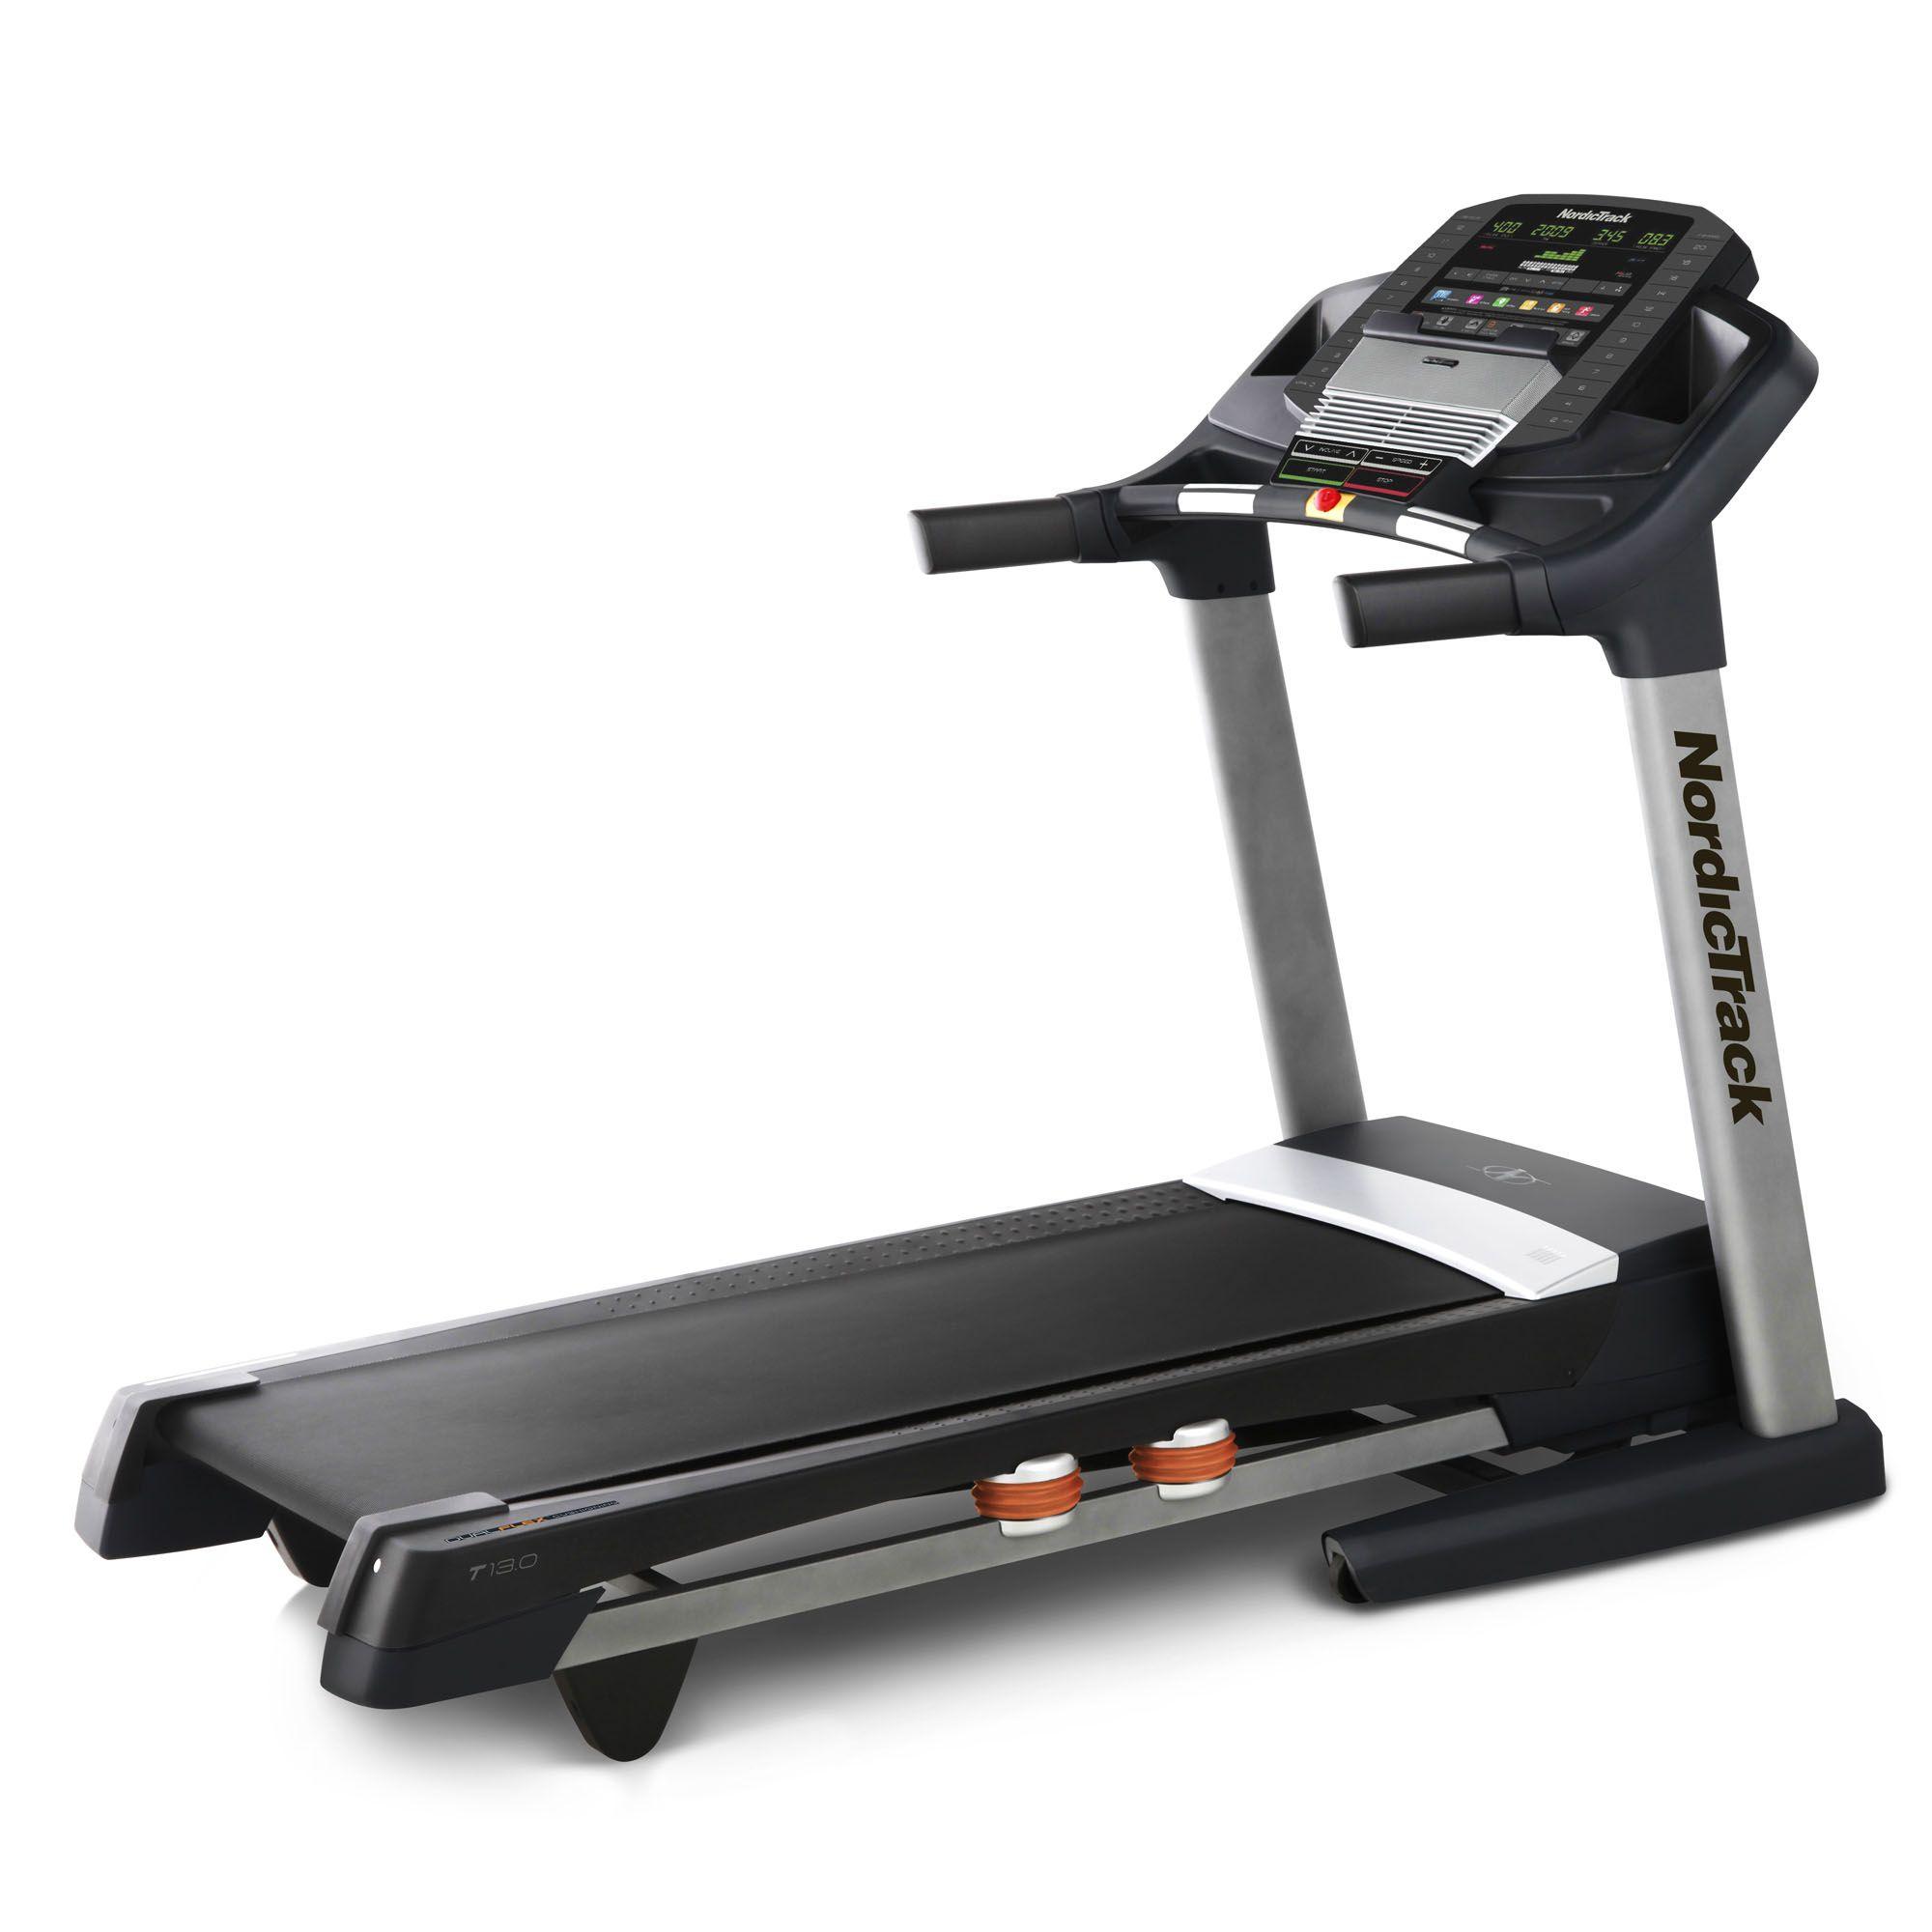 Treadmill Lubricant Nordictrack: NordicTrack T13.0 Treadmill